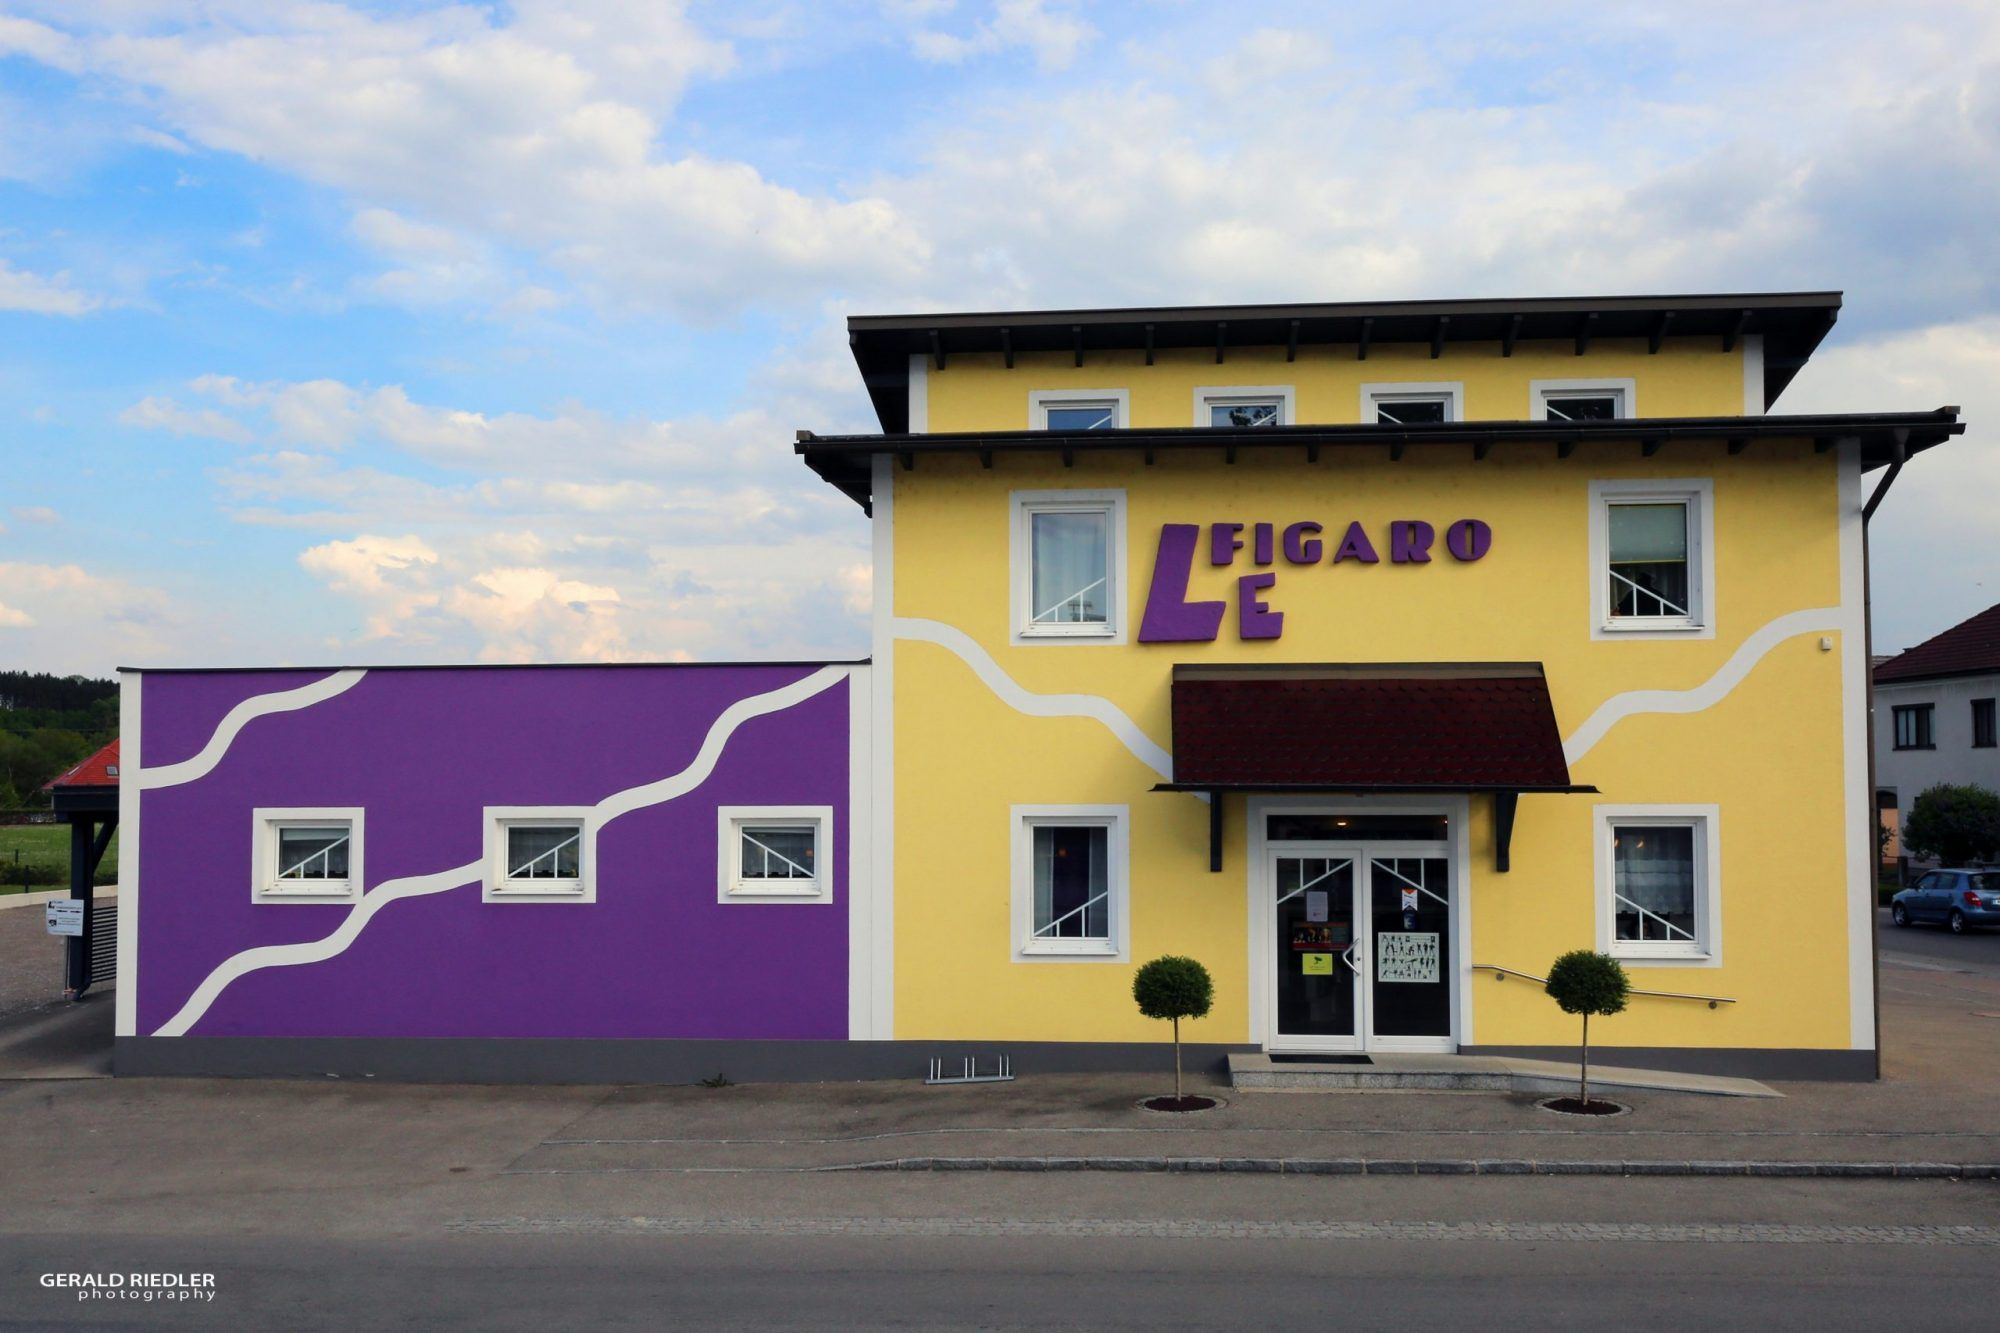 Haus Figaro - Le Figaro Petzenkirchen